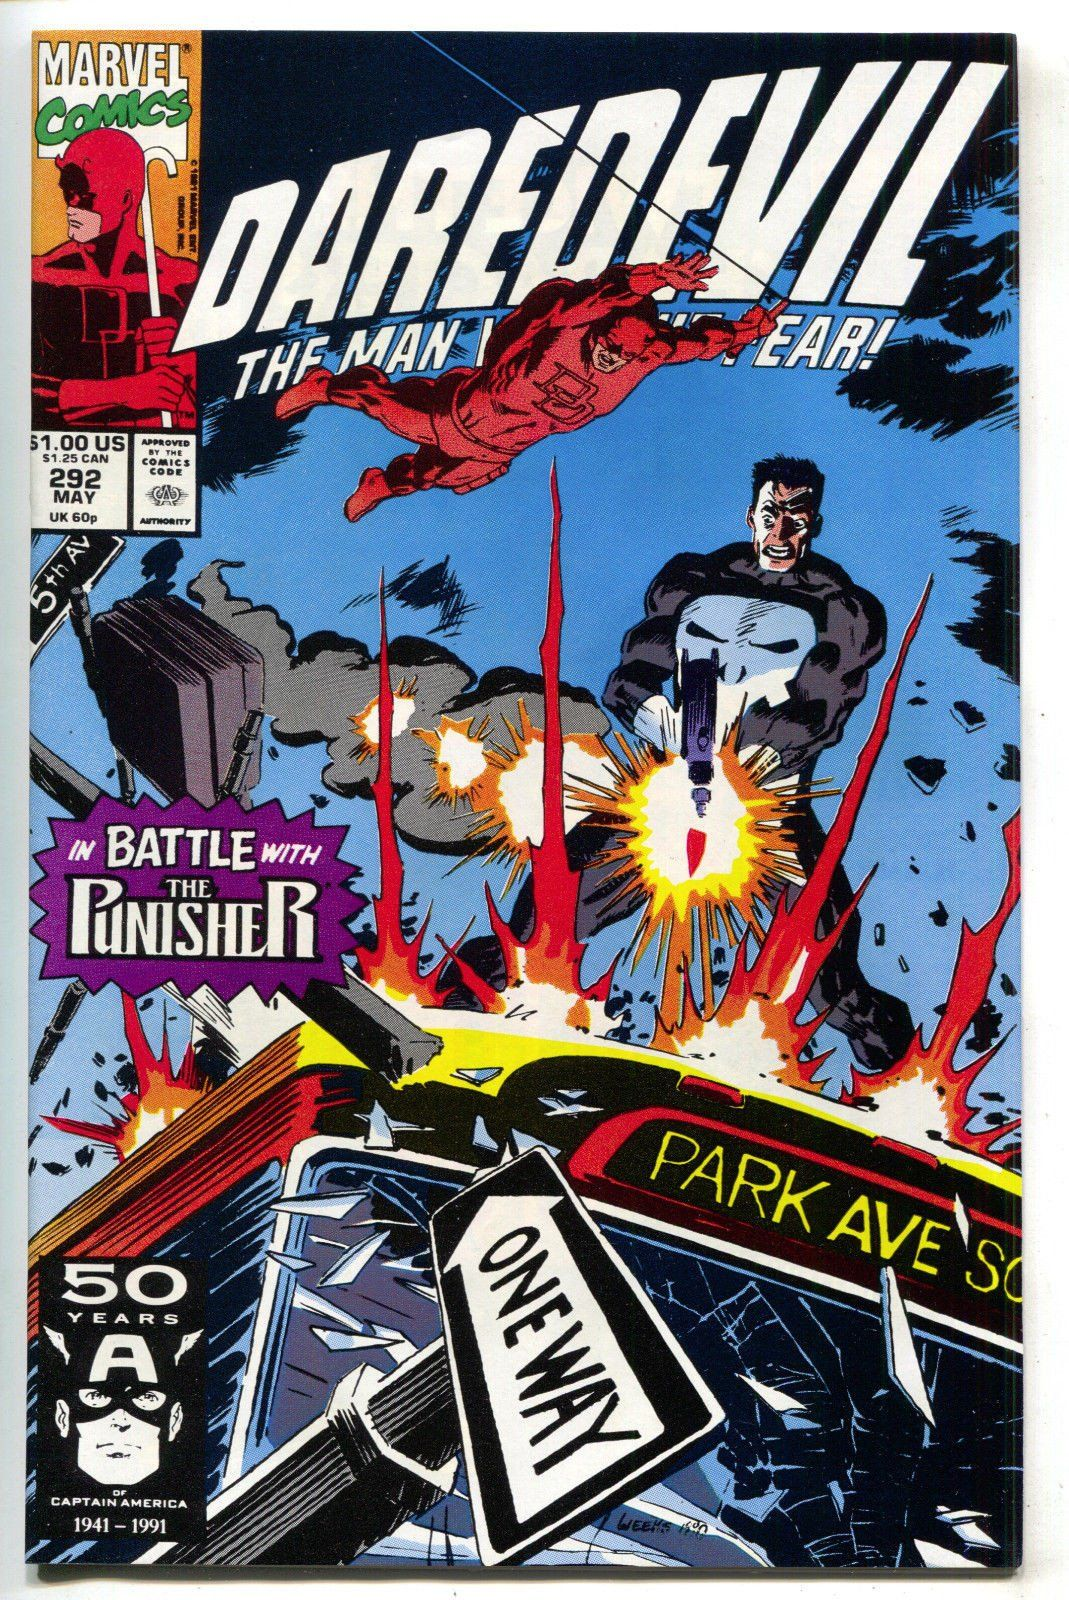 DAY MEN #1 Boom Studios Comic Book 1st Print SOLD OUT Near Mint NM